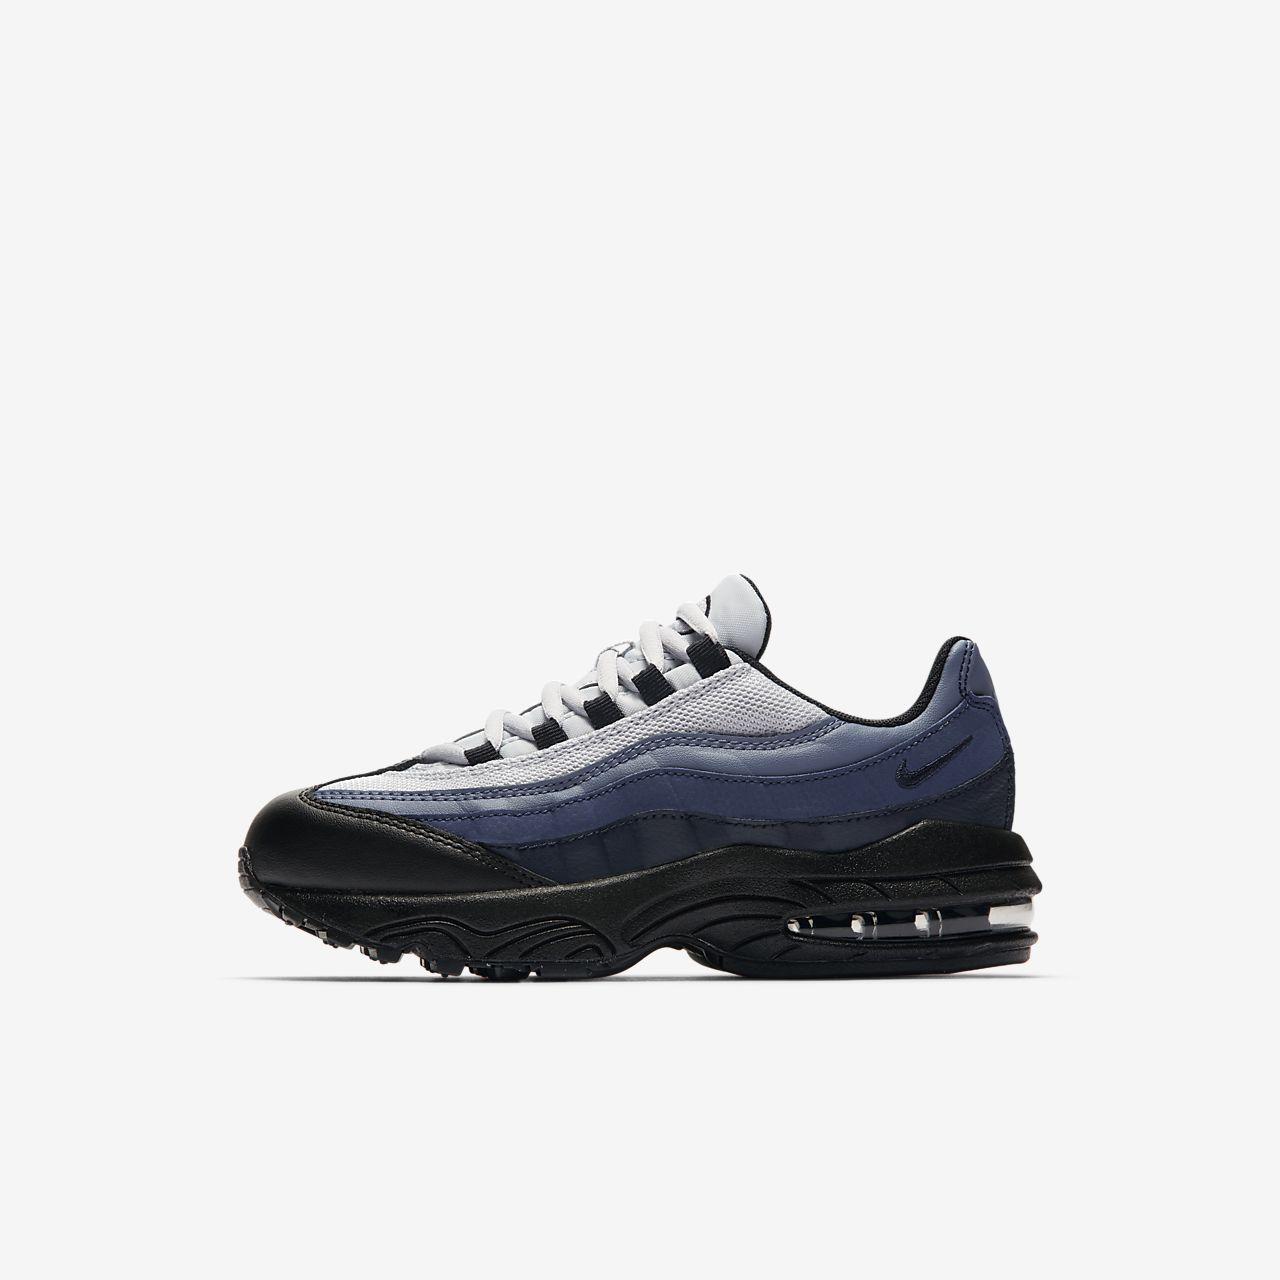 ... Nike Air Max 95-sko til små børn